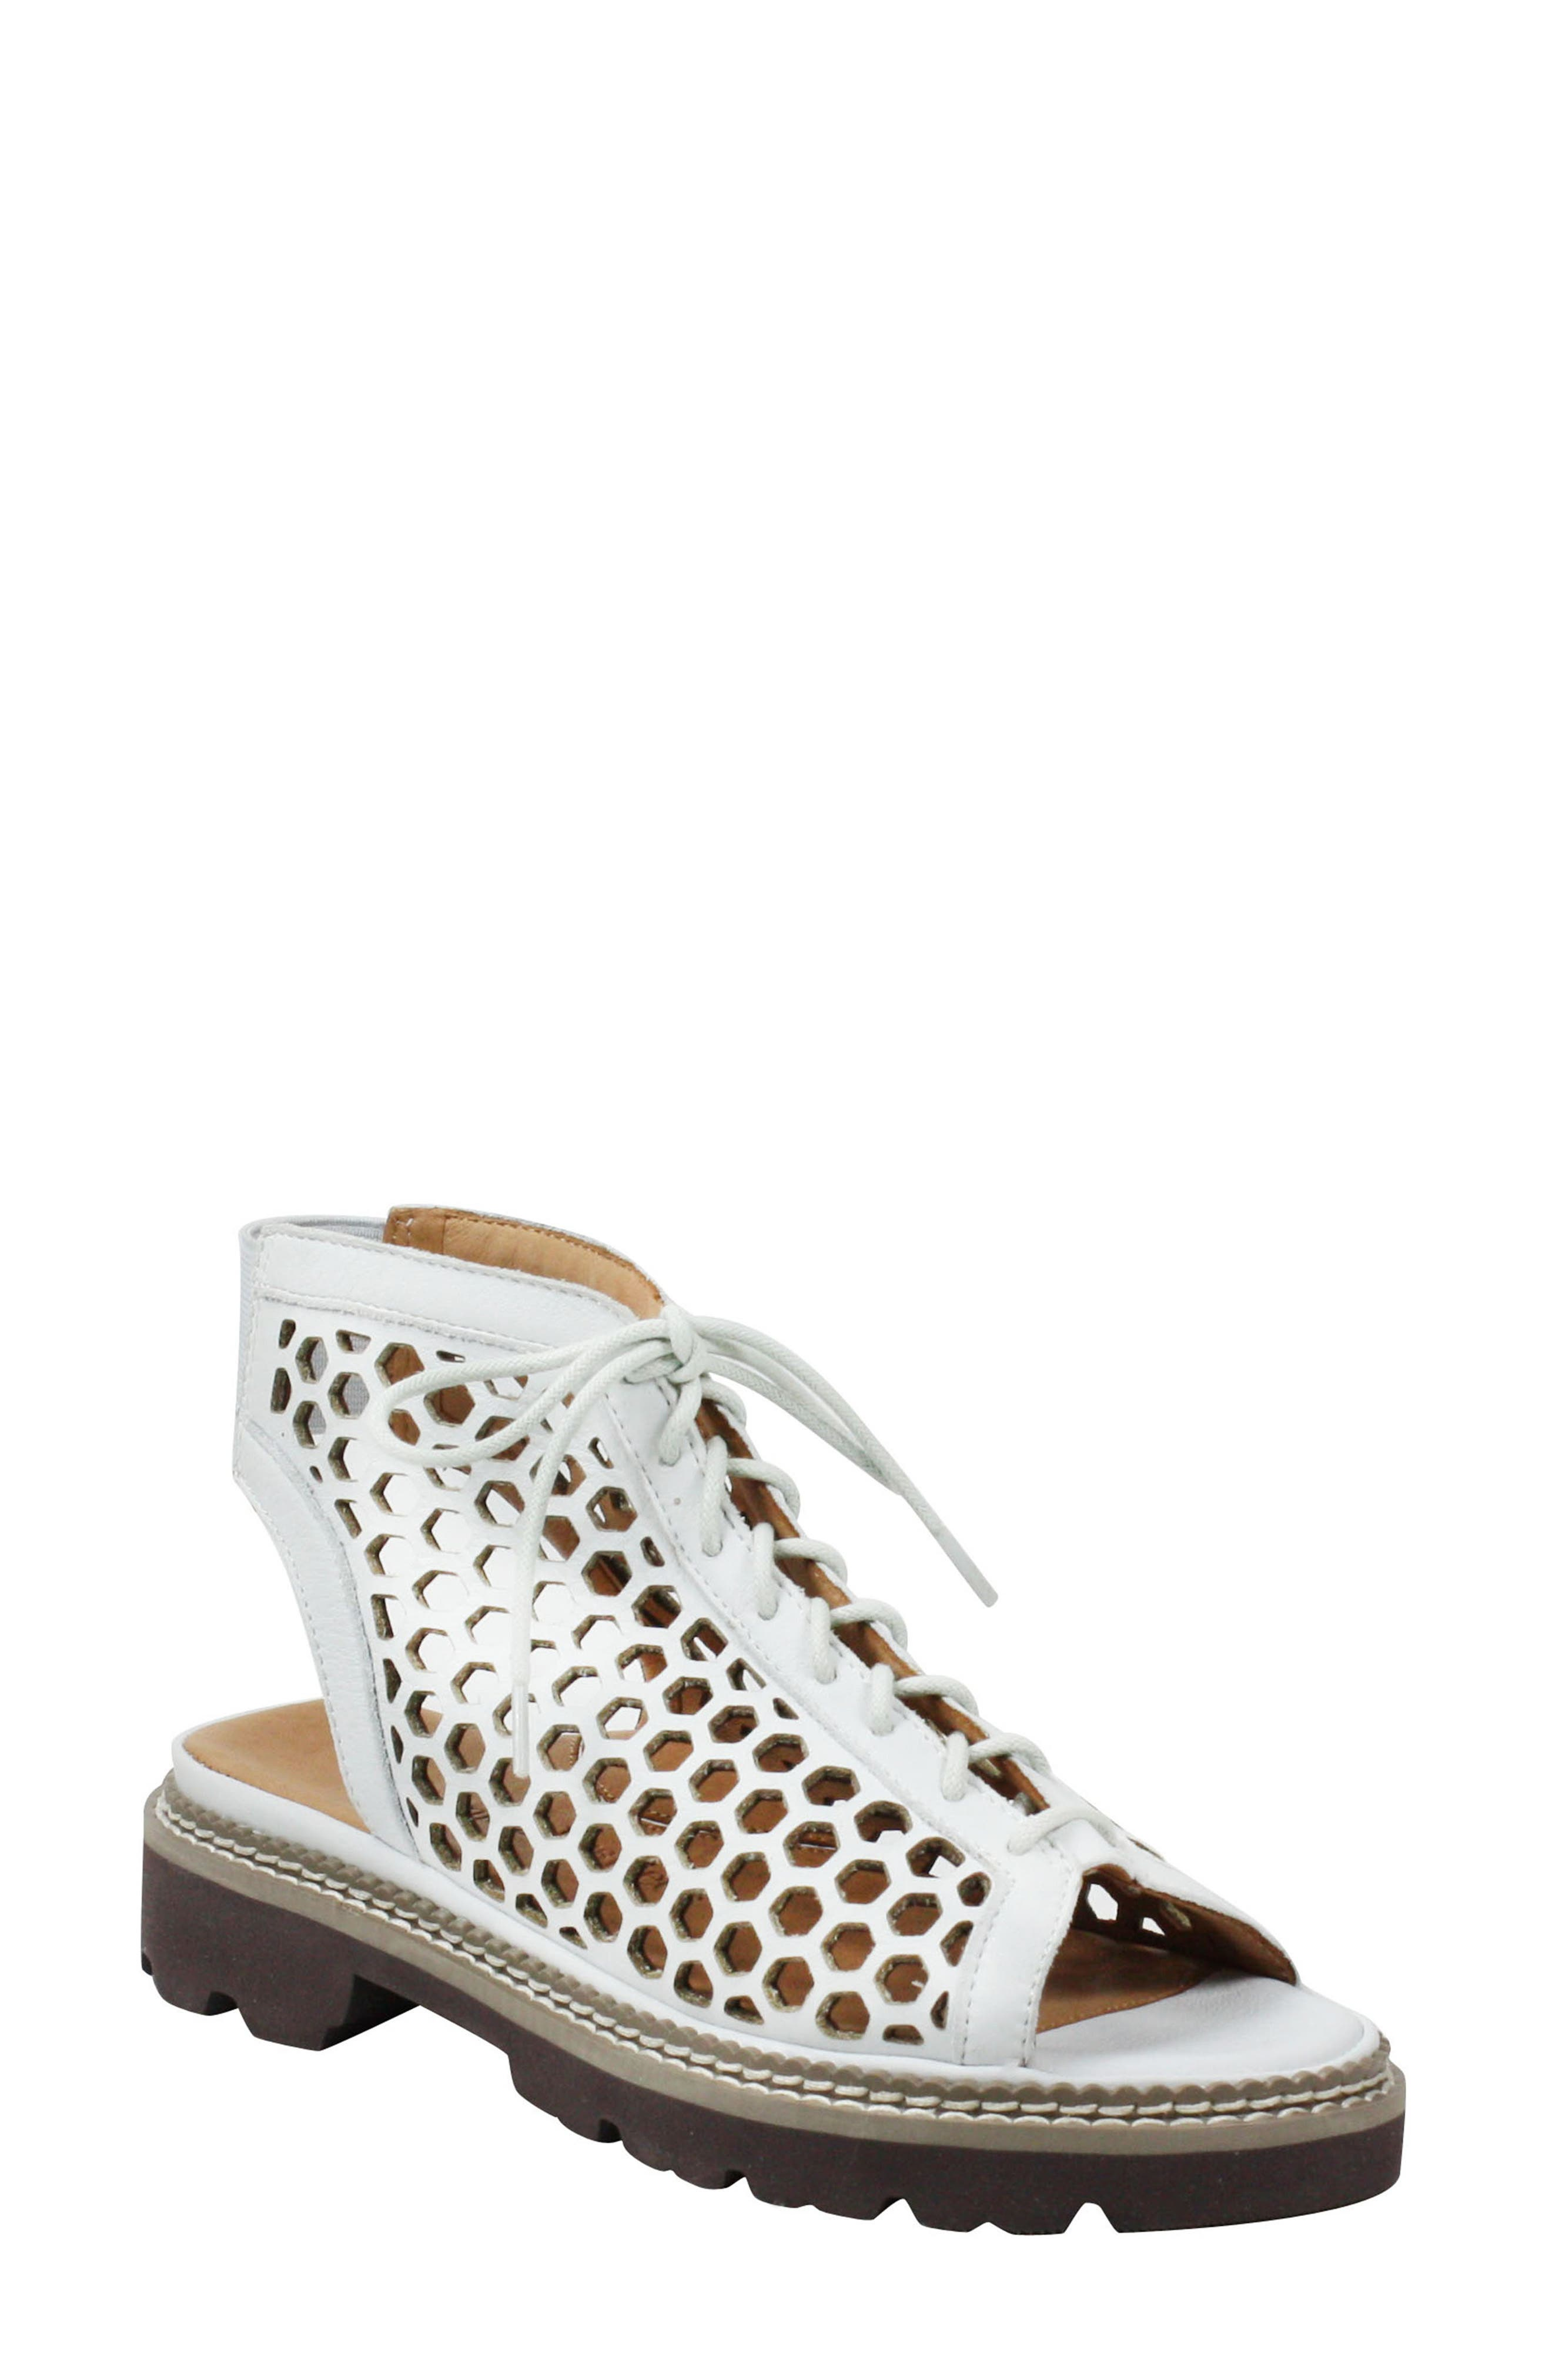 Women's Lace-Up Sandals: Sale | Nordstrom